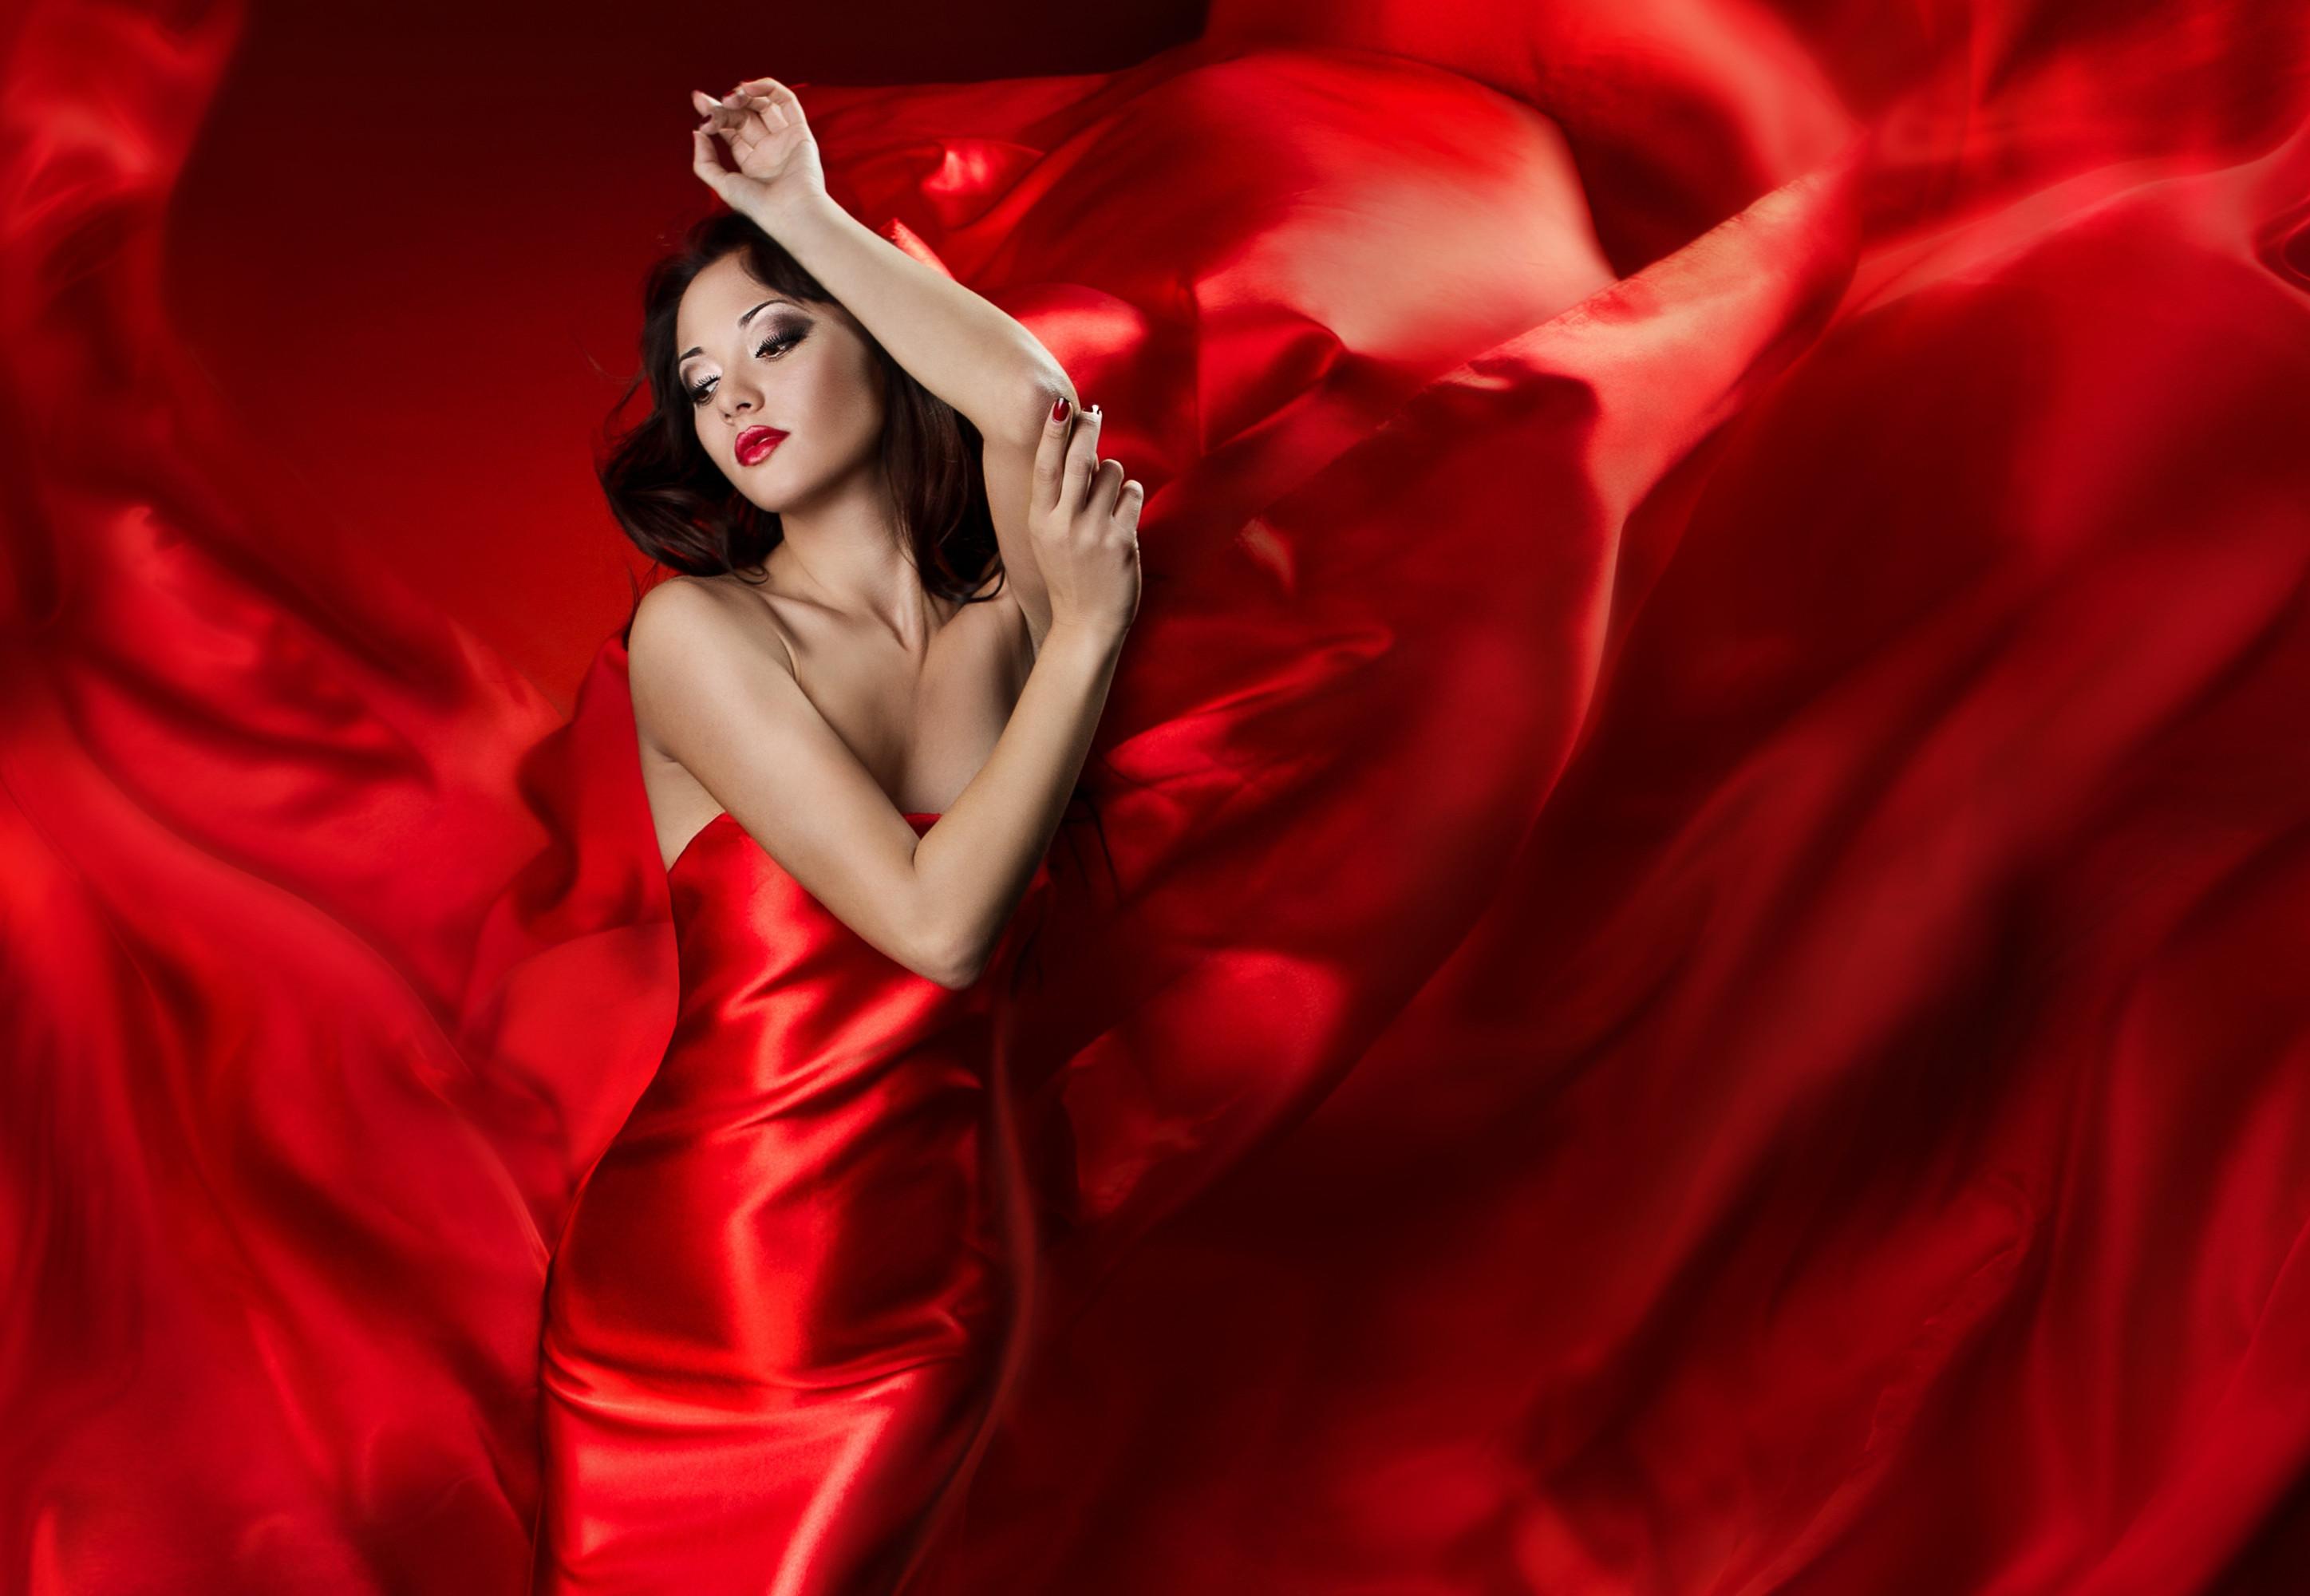 Res: 2895x2000, Women - Model Lipstick Woman Girl Red Satin Red Dress Brunette Wallpaper